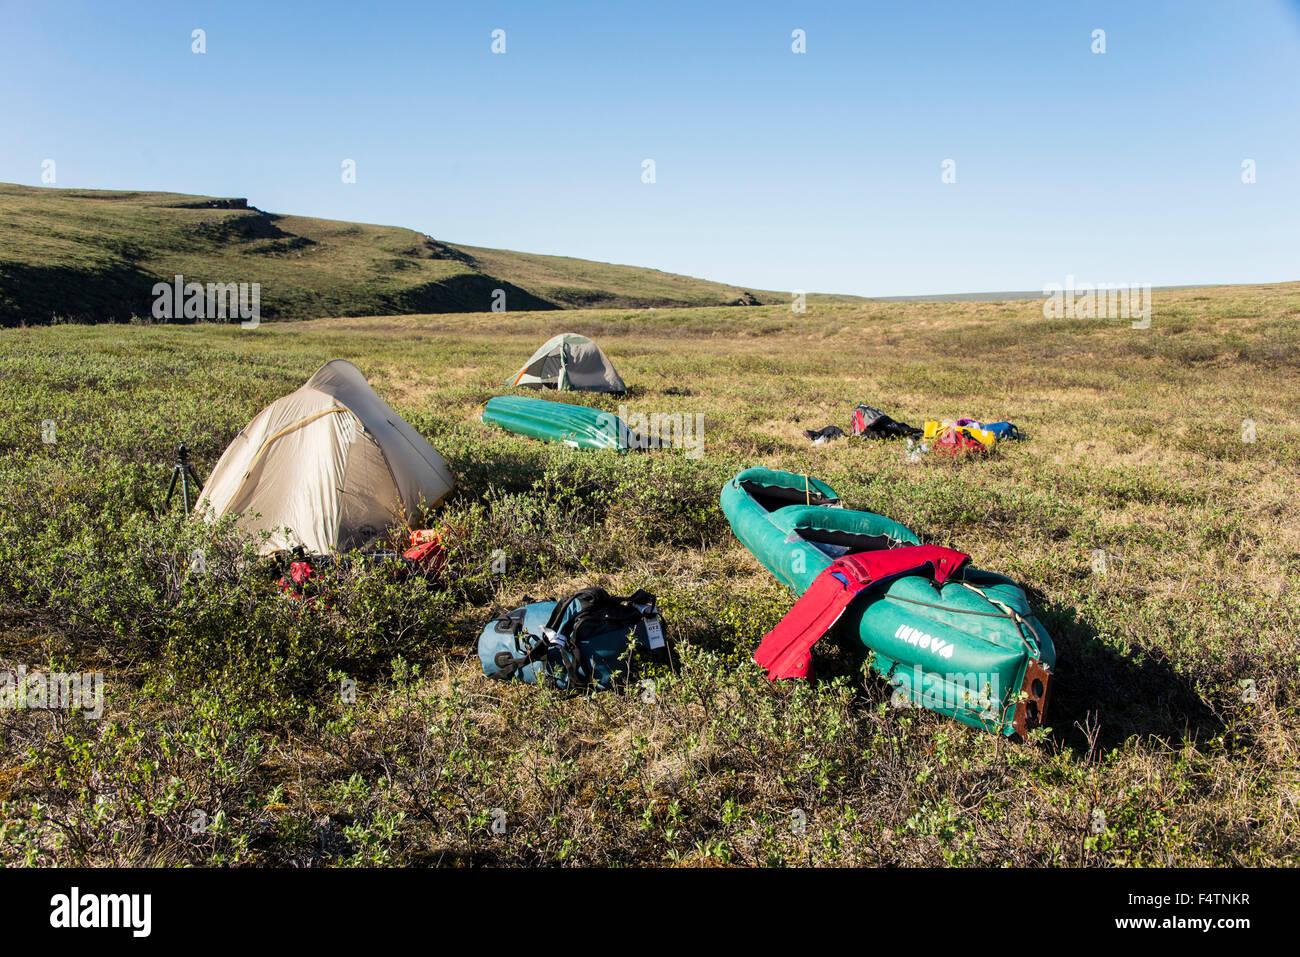 Camping, camping, expedición, reserva nacional del petróleo, la reserva de petróleo, Alaska, EE.UU., Imagen De Stock